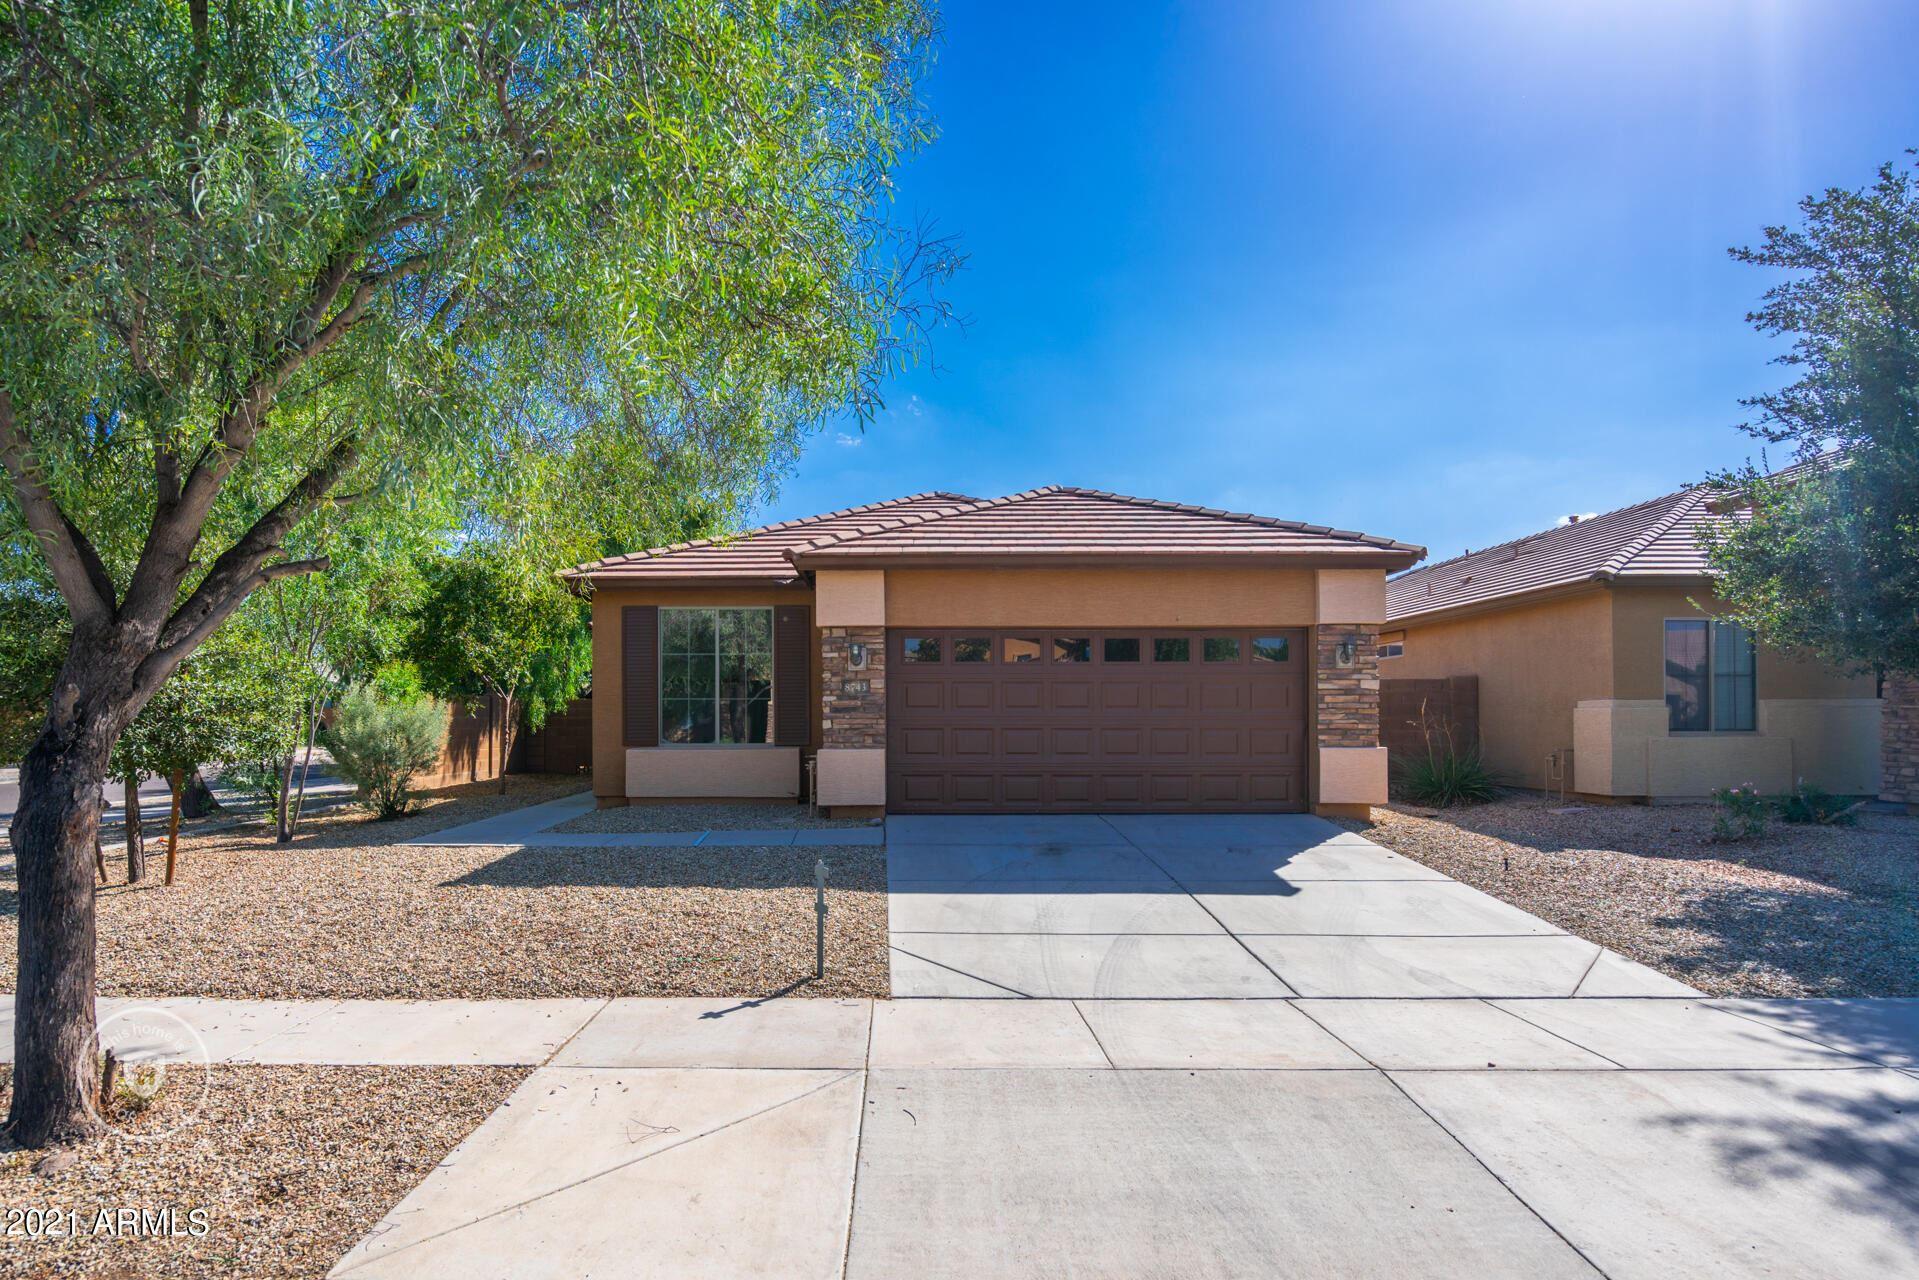 Photo of 8743 W PIONEER Street, Tolleson, AZ 85353 (MLS # 6309830)